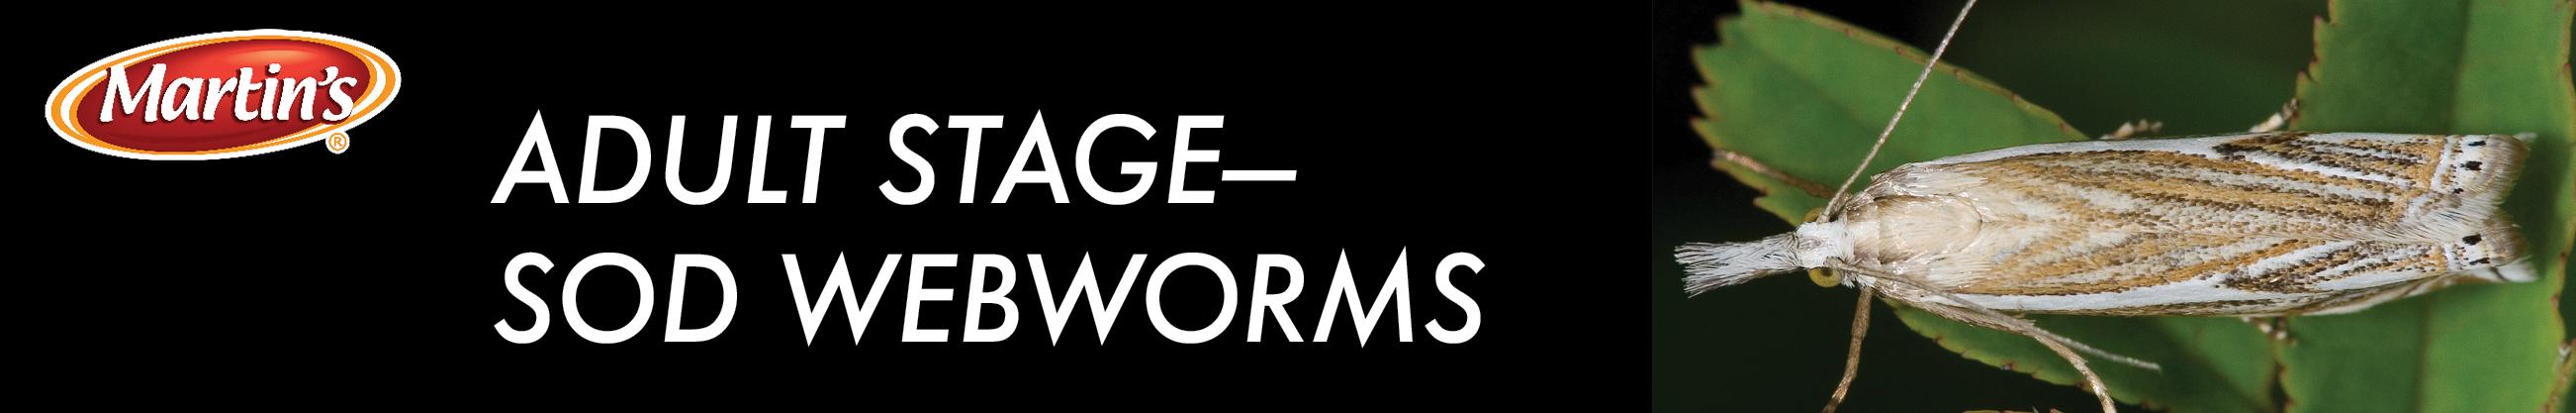 adult sod webworm